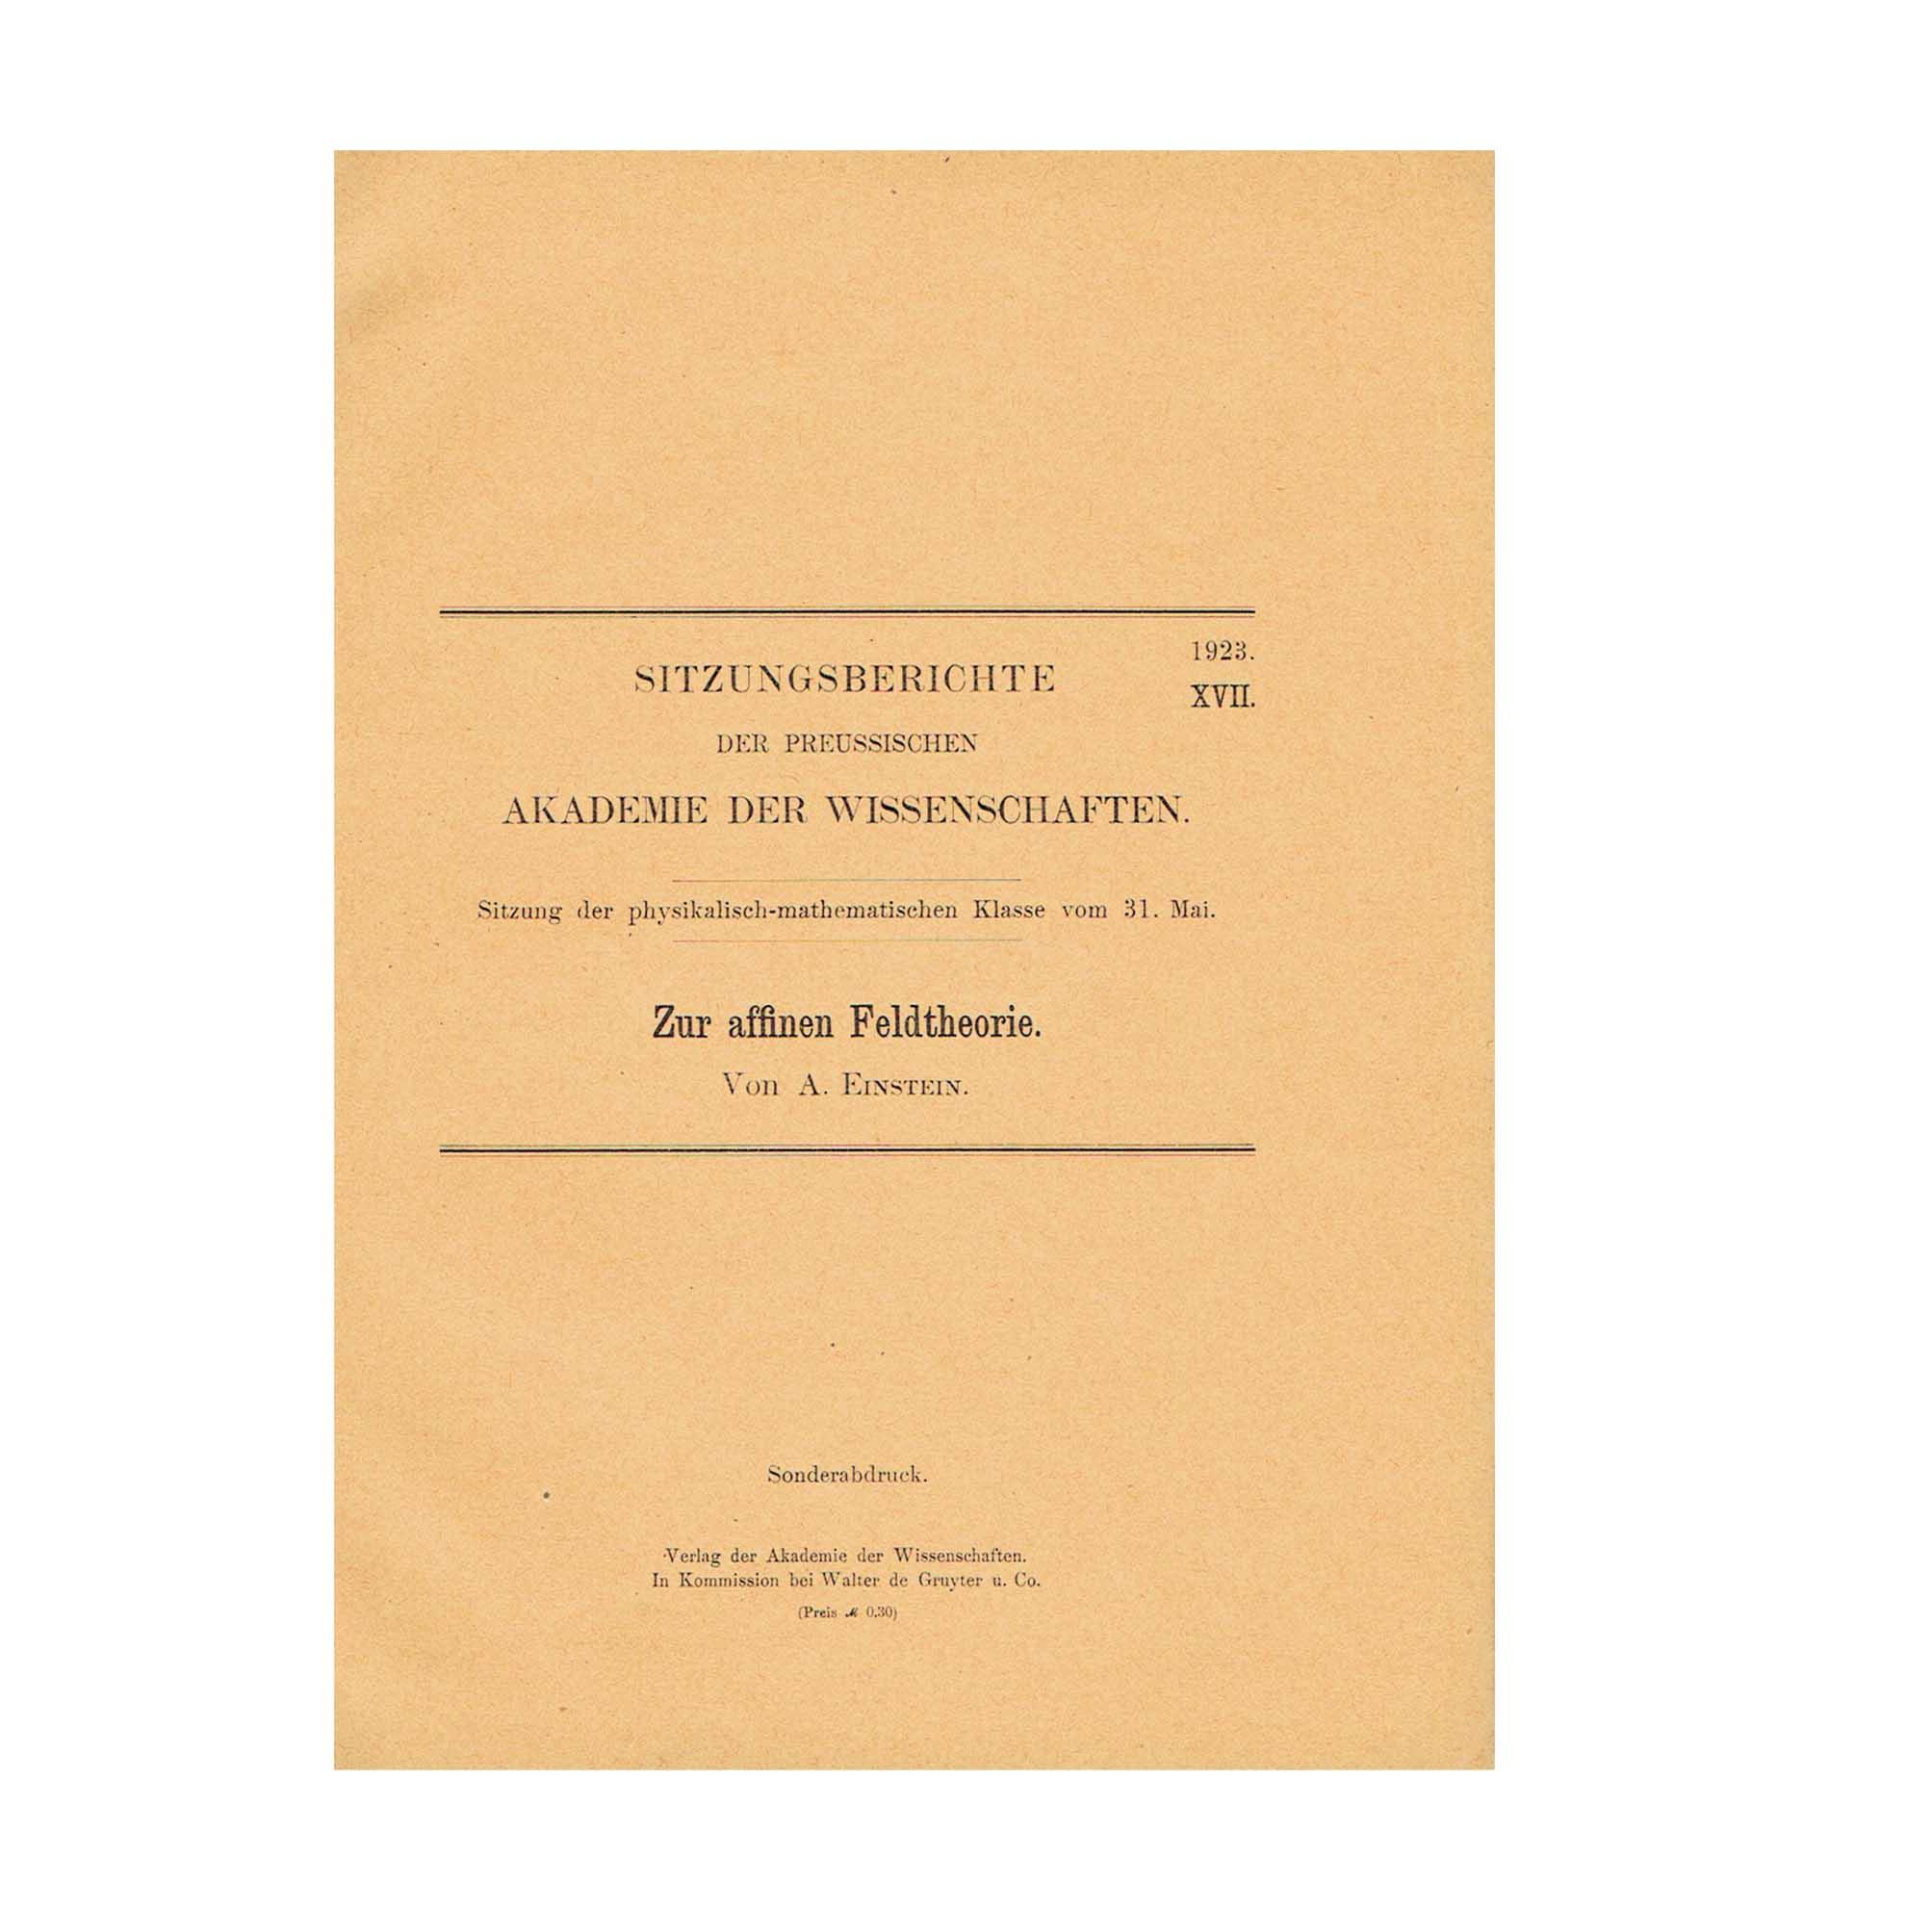 5730-Einstein-Affine-Field-Theory-Akademie-XVII-1923-SA-Cover-recto-N.jpg